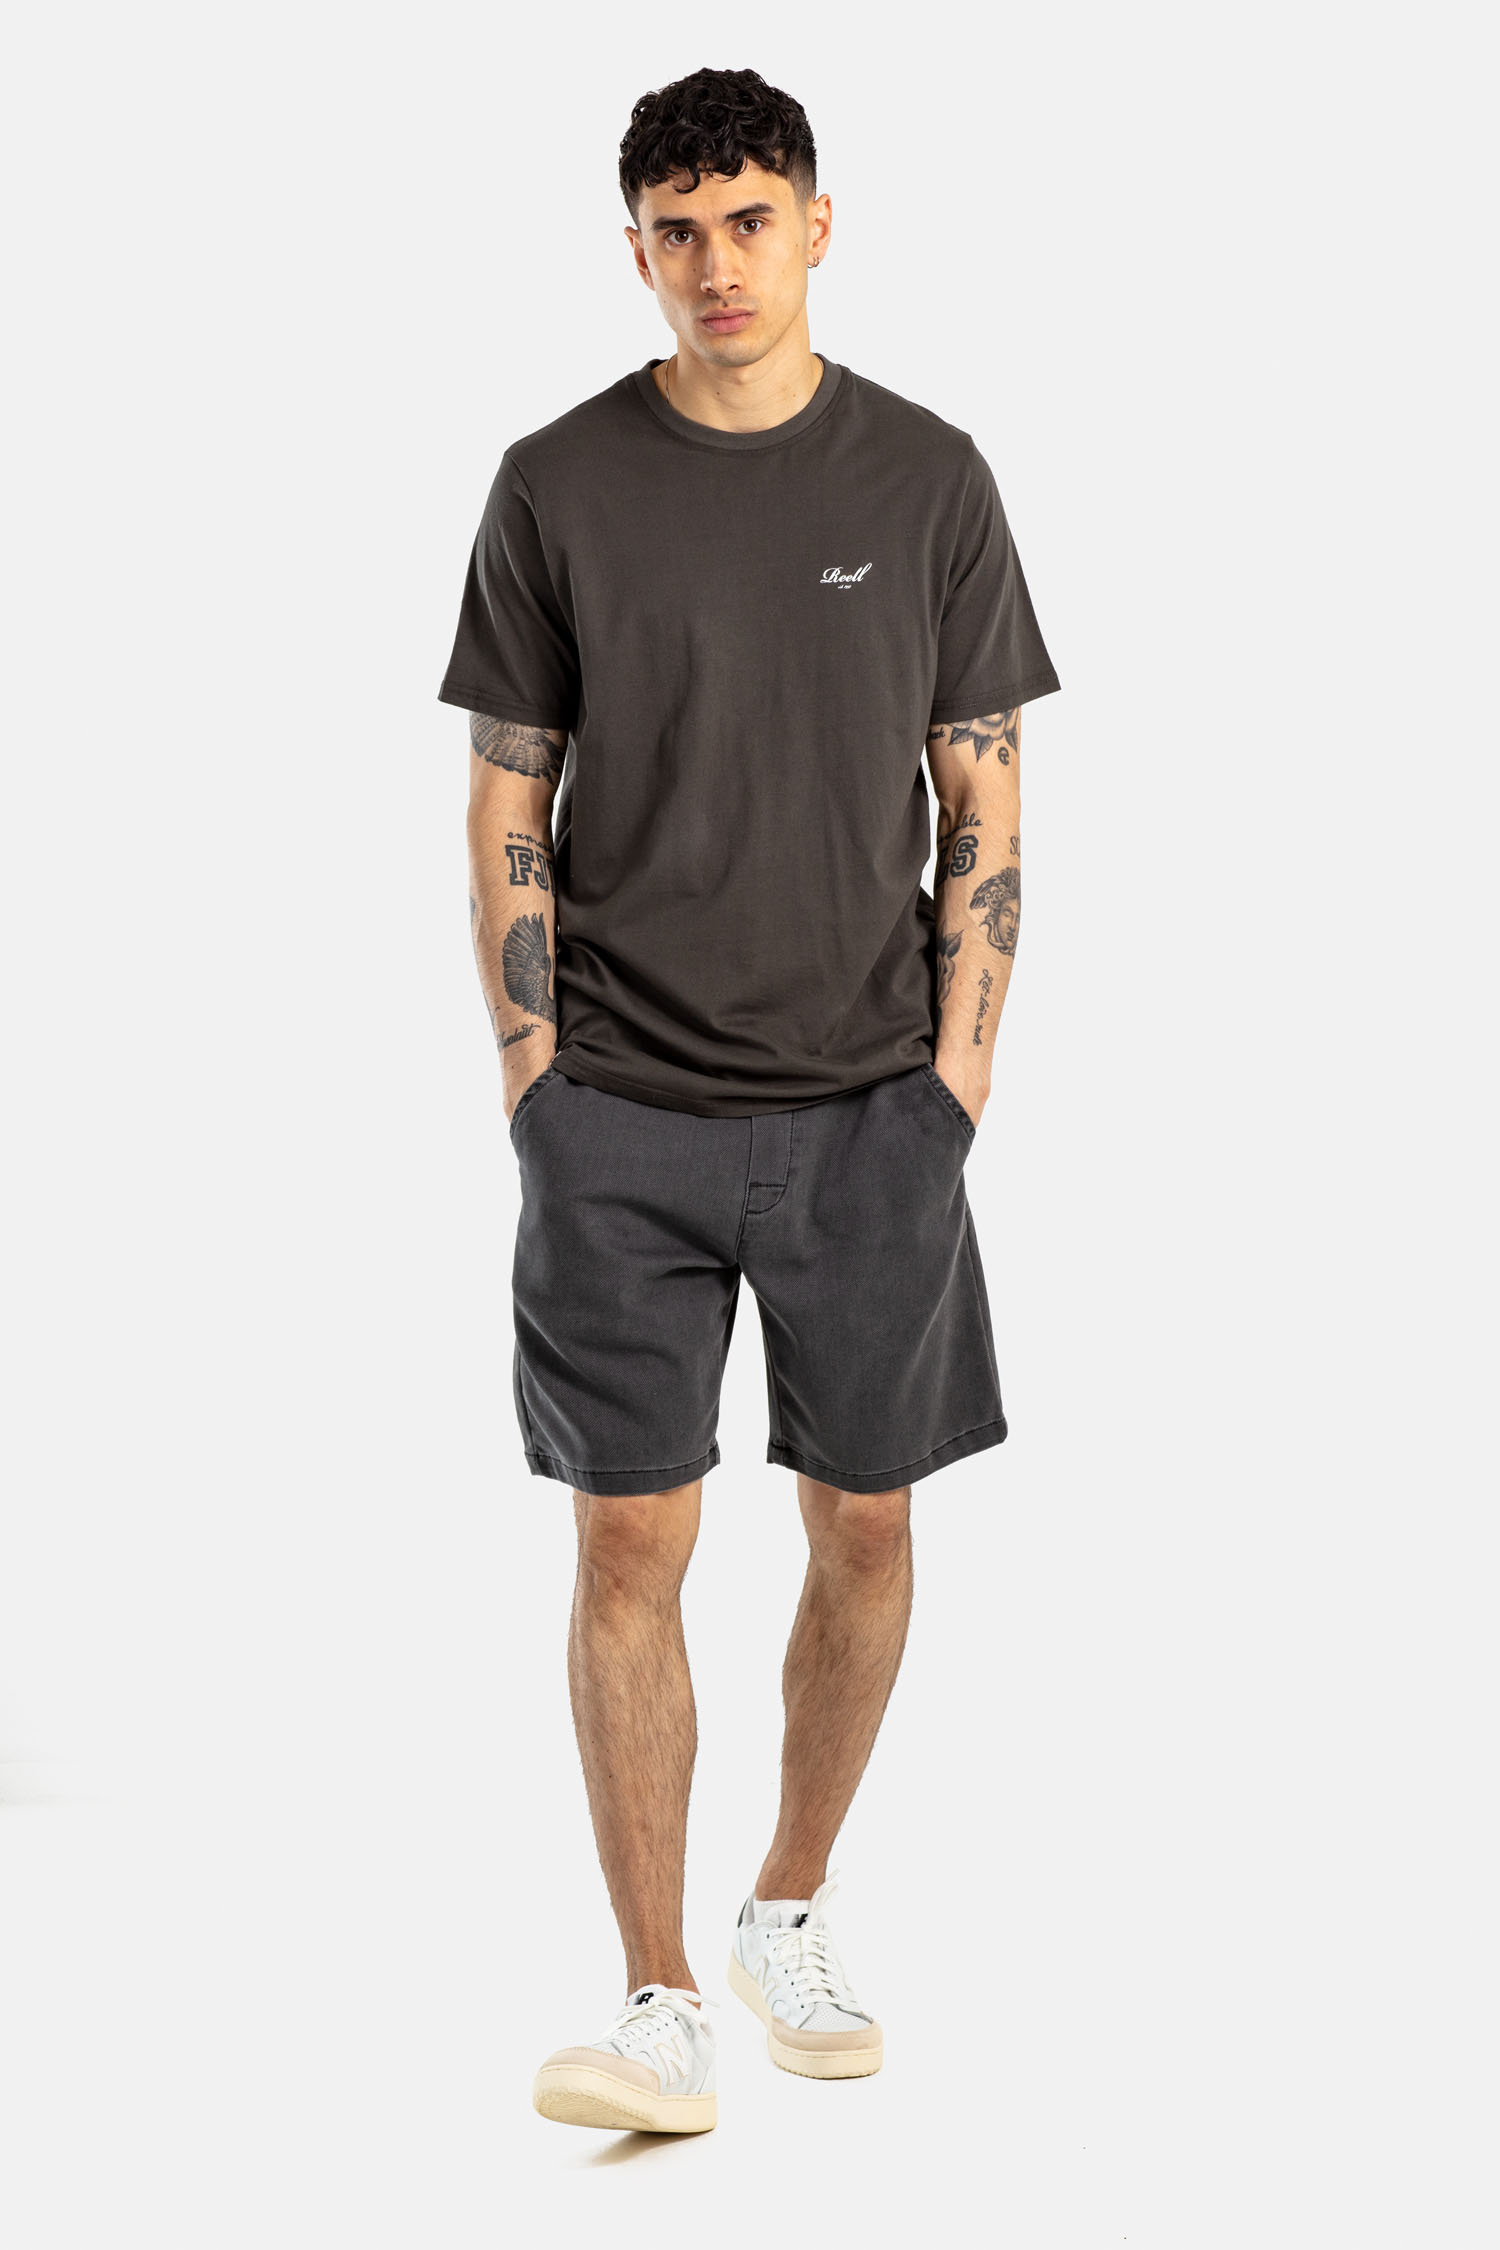 REELL-REFLEX-EASY-SHORT-Short-Hose-grey-weave